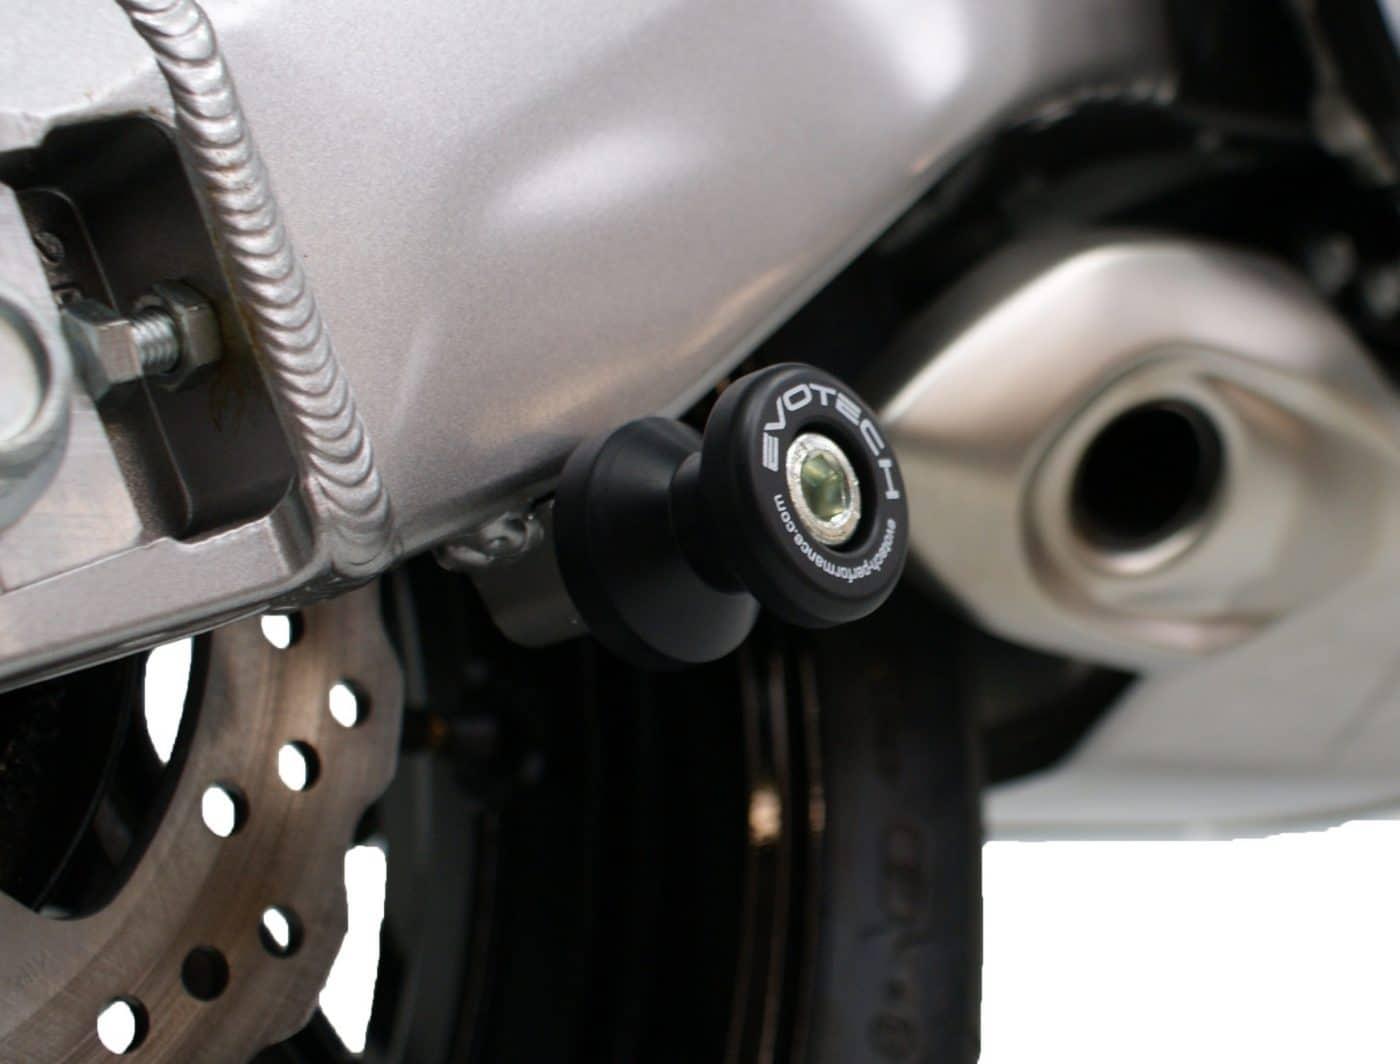 paddock stand bobbins goedkope motor accessoire